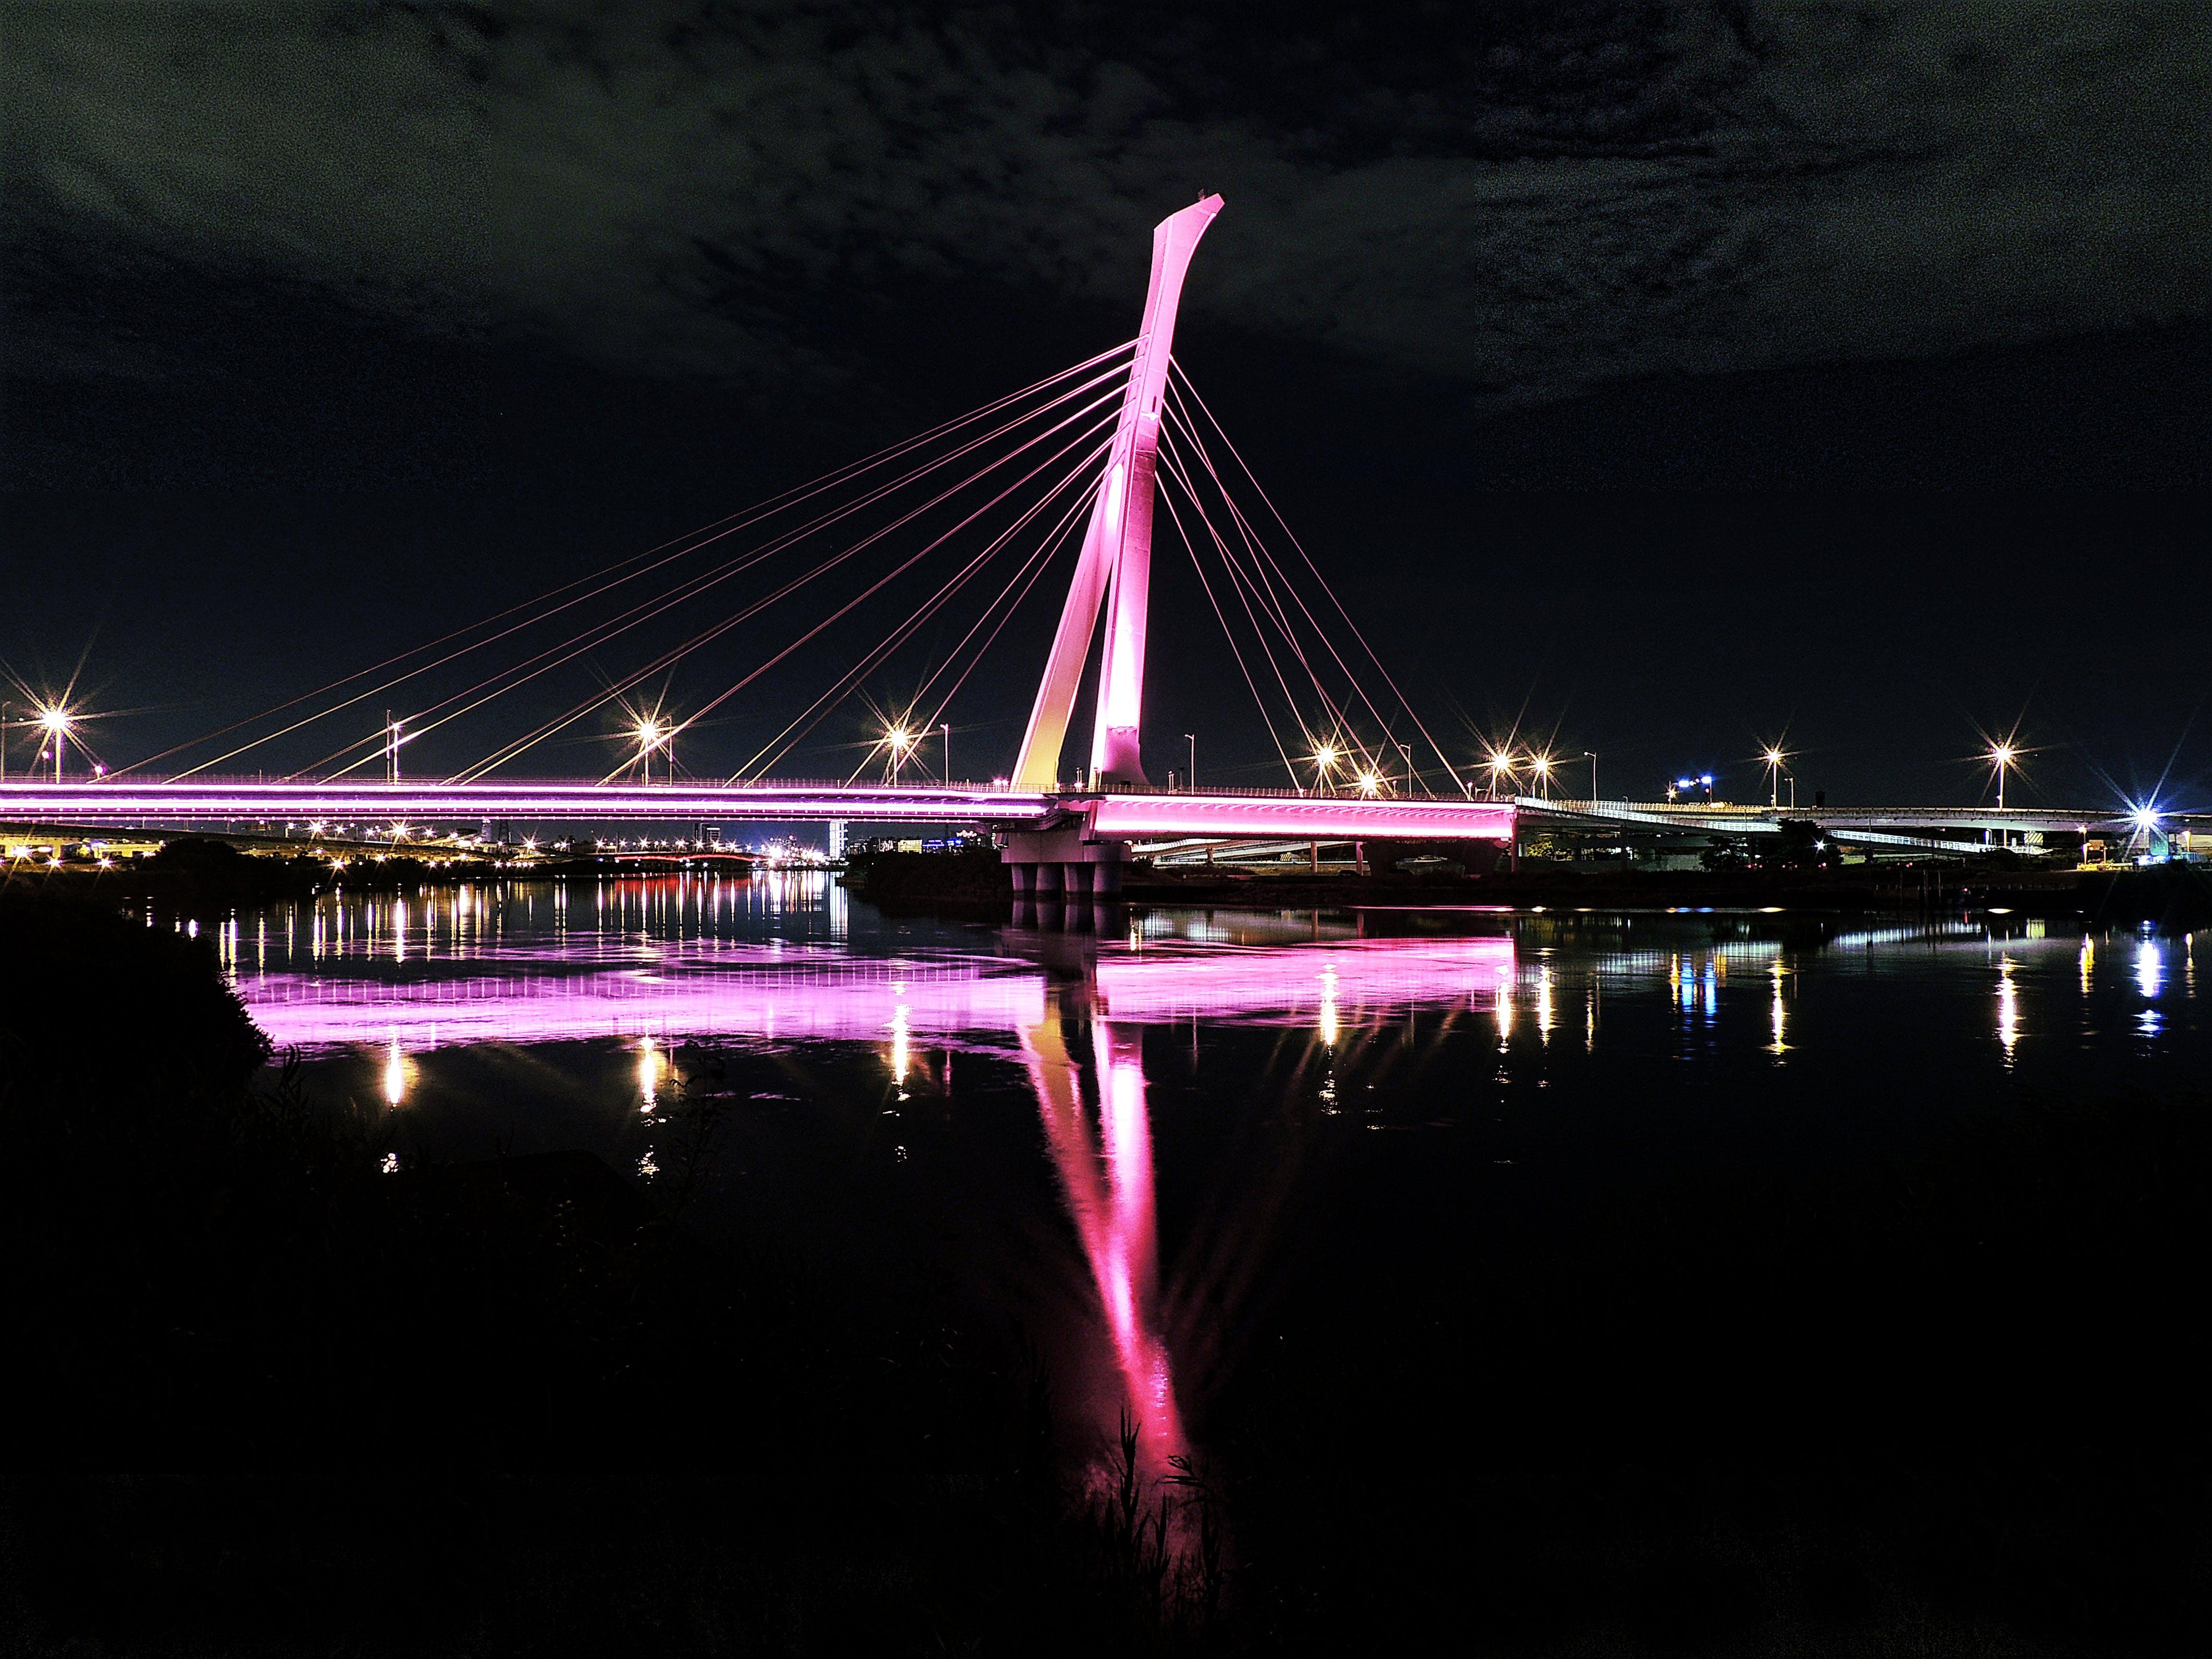 Lightened Bridge during Nighttime